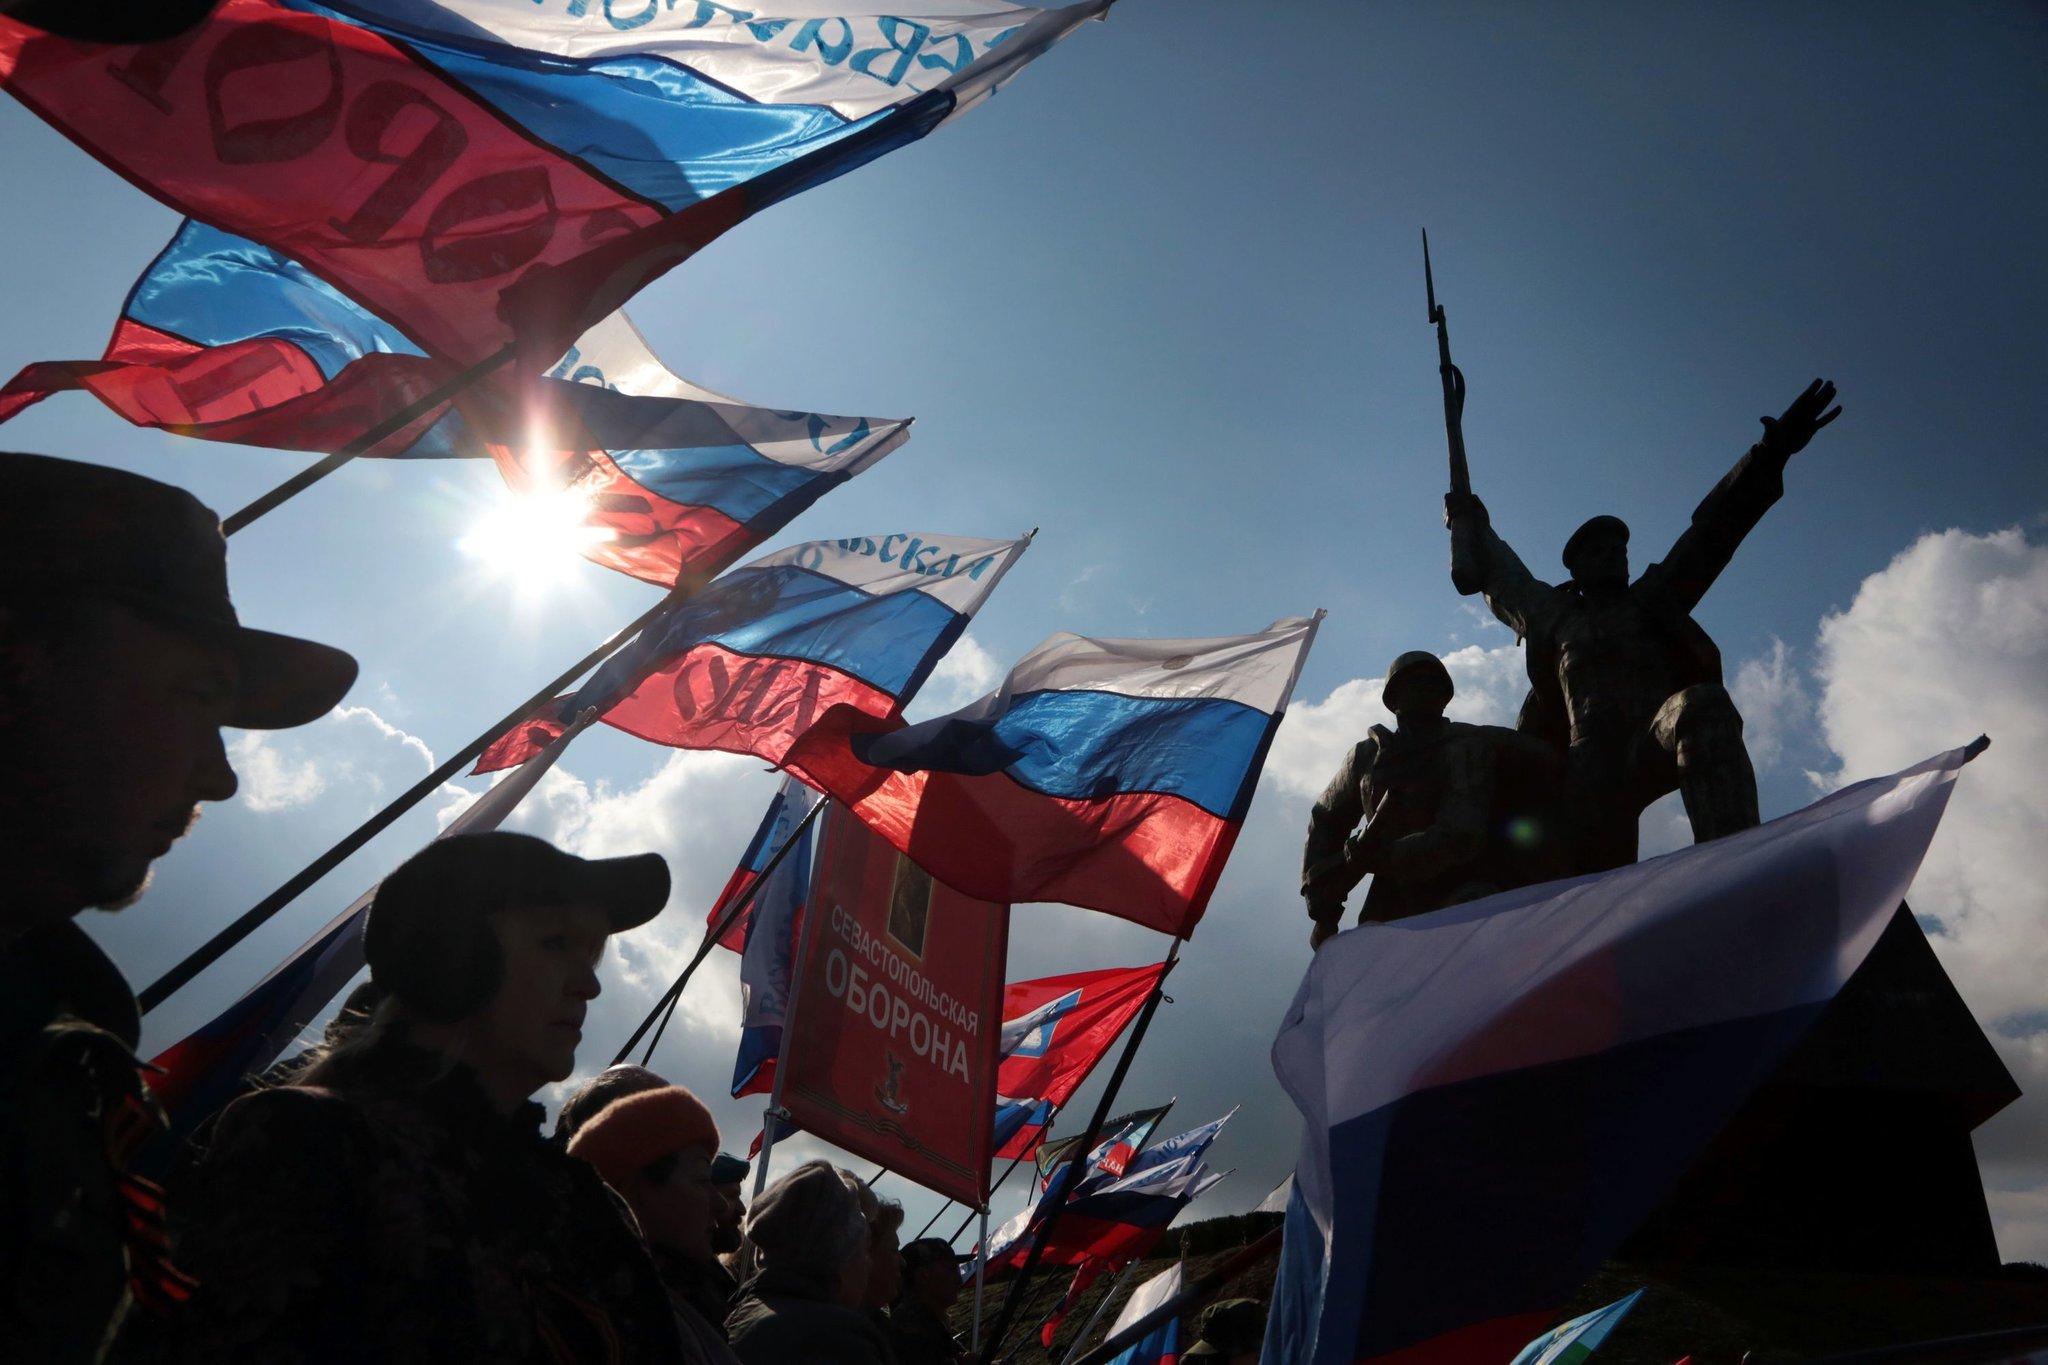 Građani Sevastopolja sa ruskim zastavama povodom treće godišnjice od pripajanja Krima Rusiji, mart 2017. (Foto: Max Vetrov/Agence France-Presse/Getty Images)